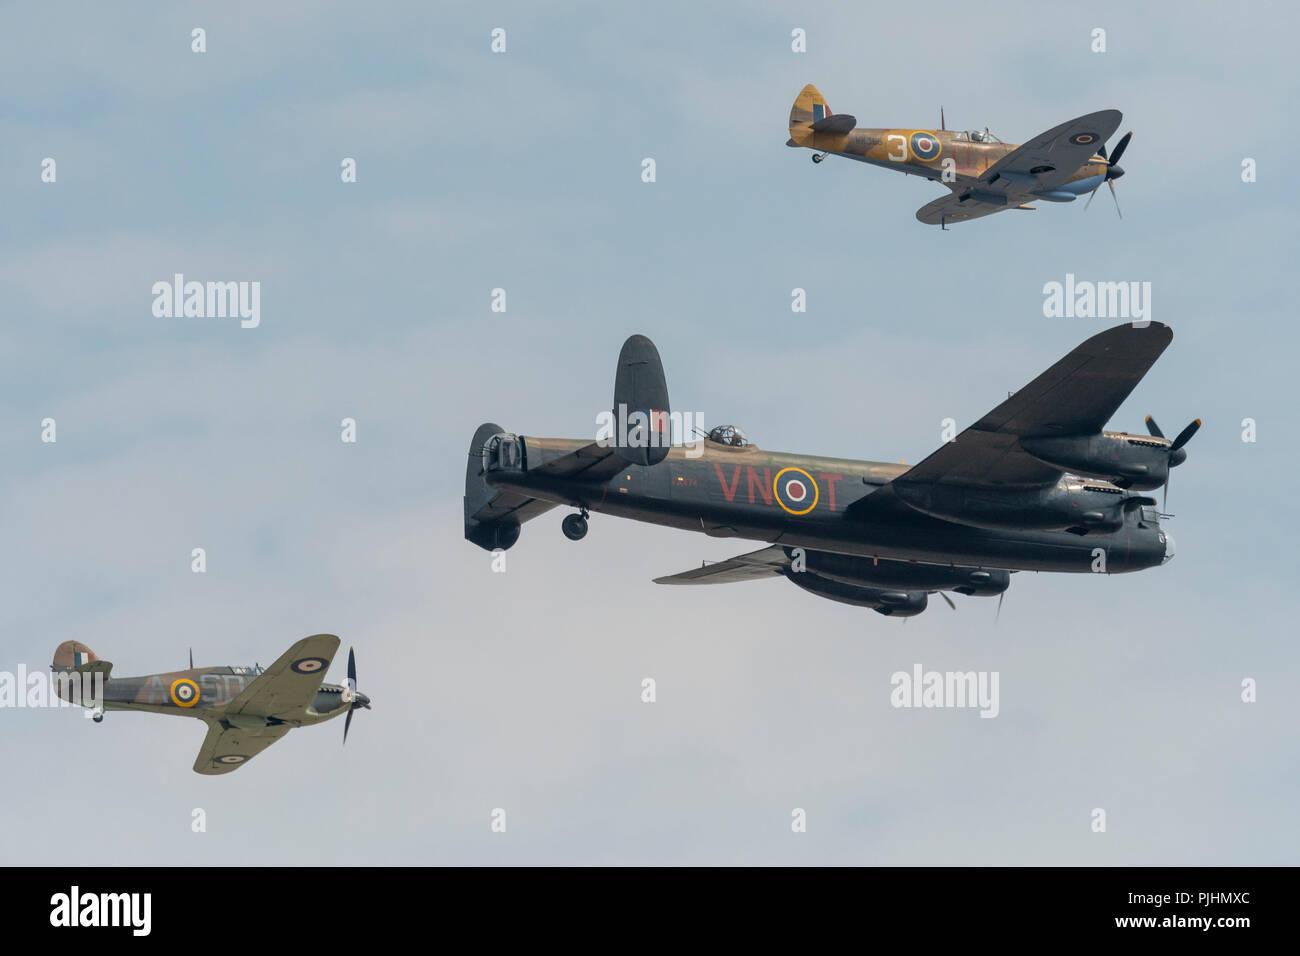 RAF Battle of Britain Memorial Flight, RIAT 2018, RAF Fairford, UK Stock Photo